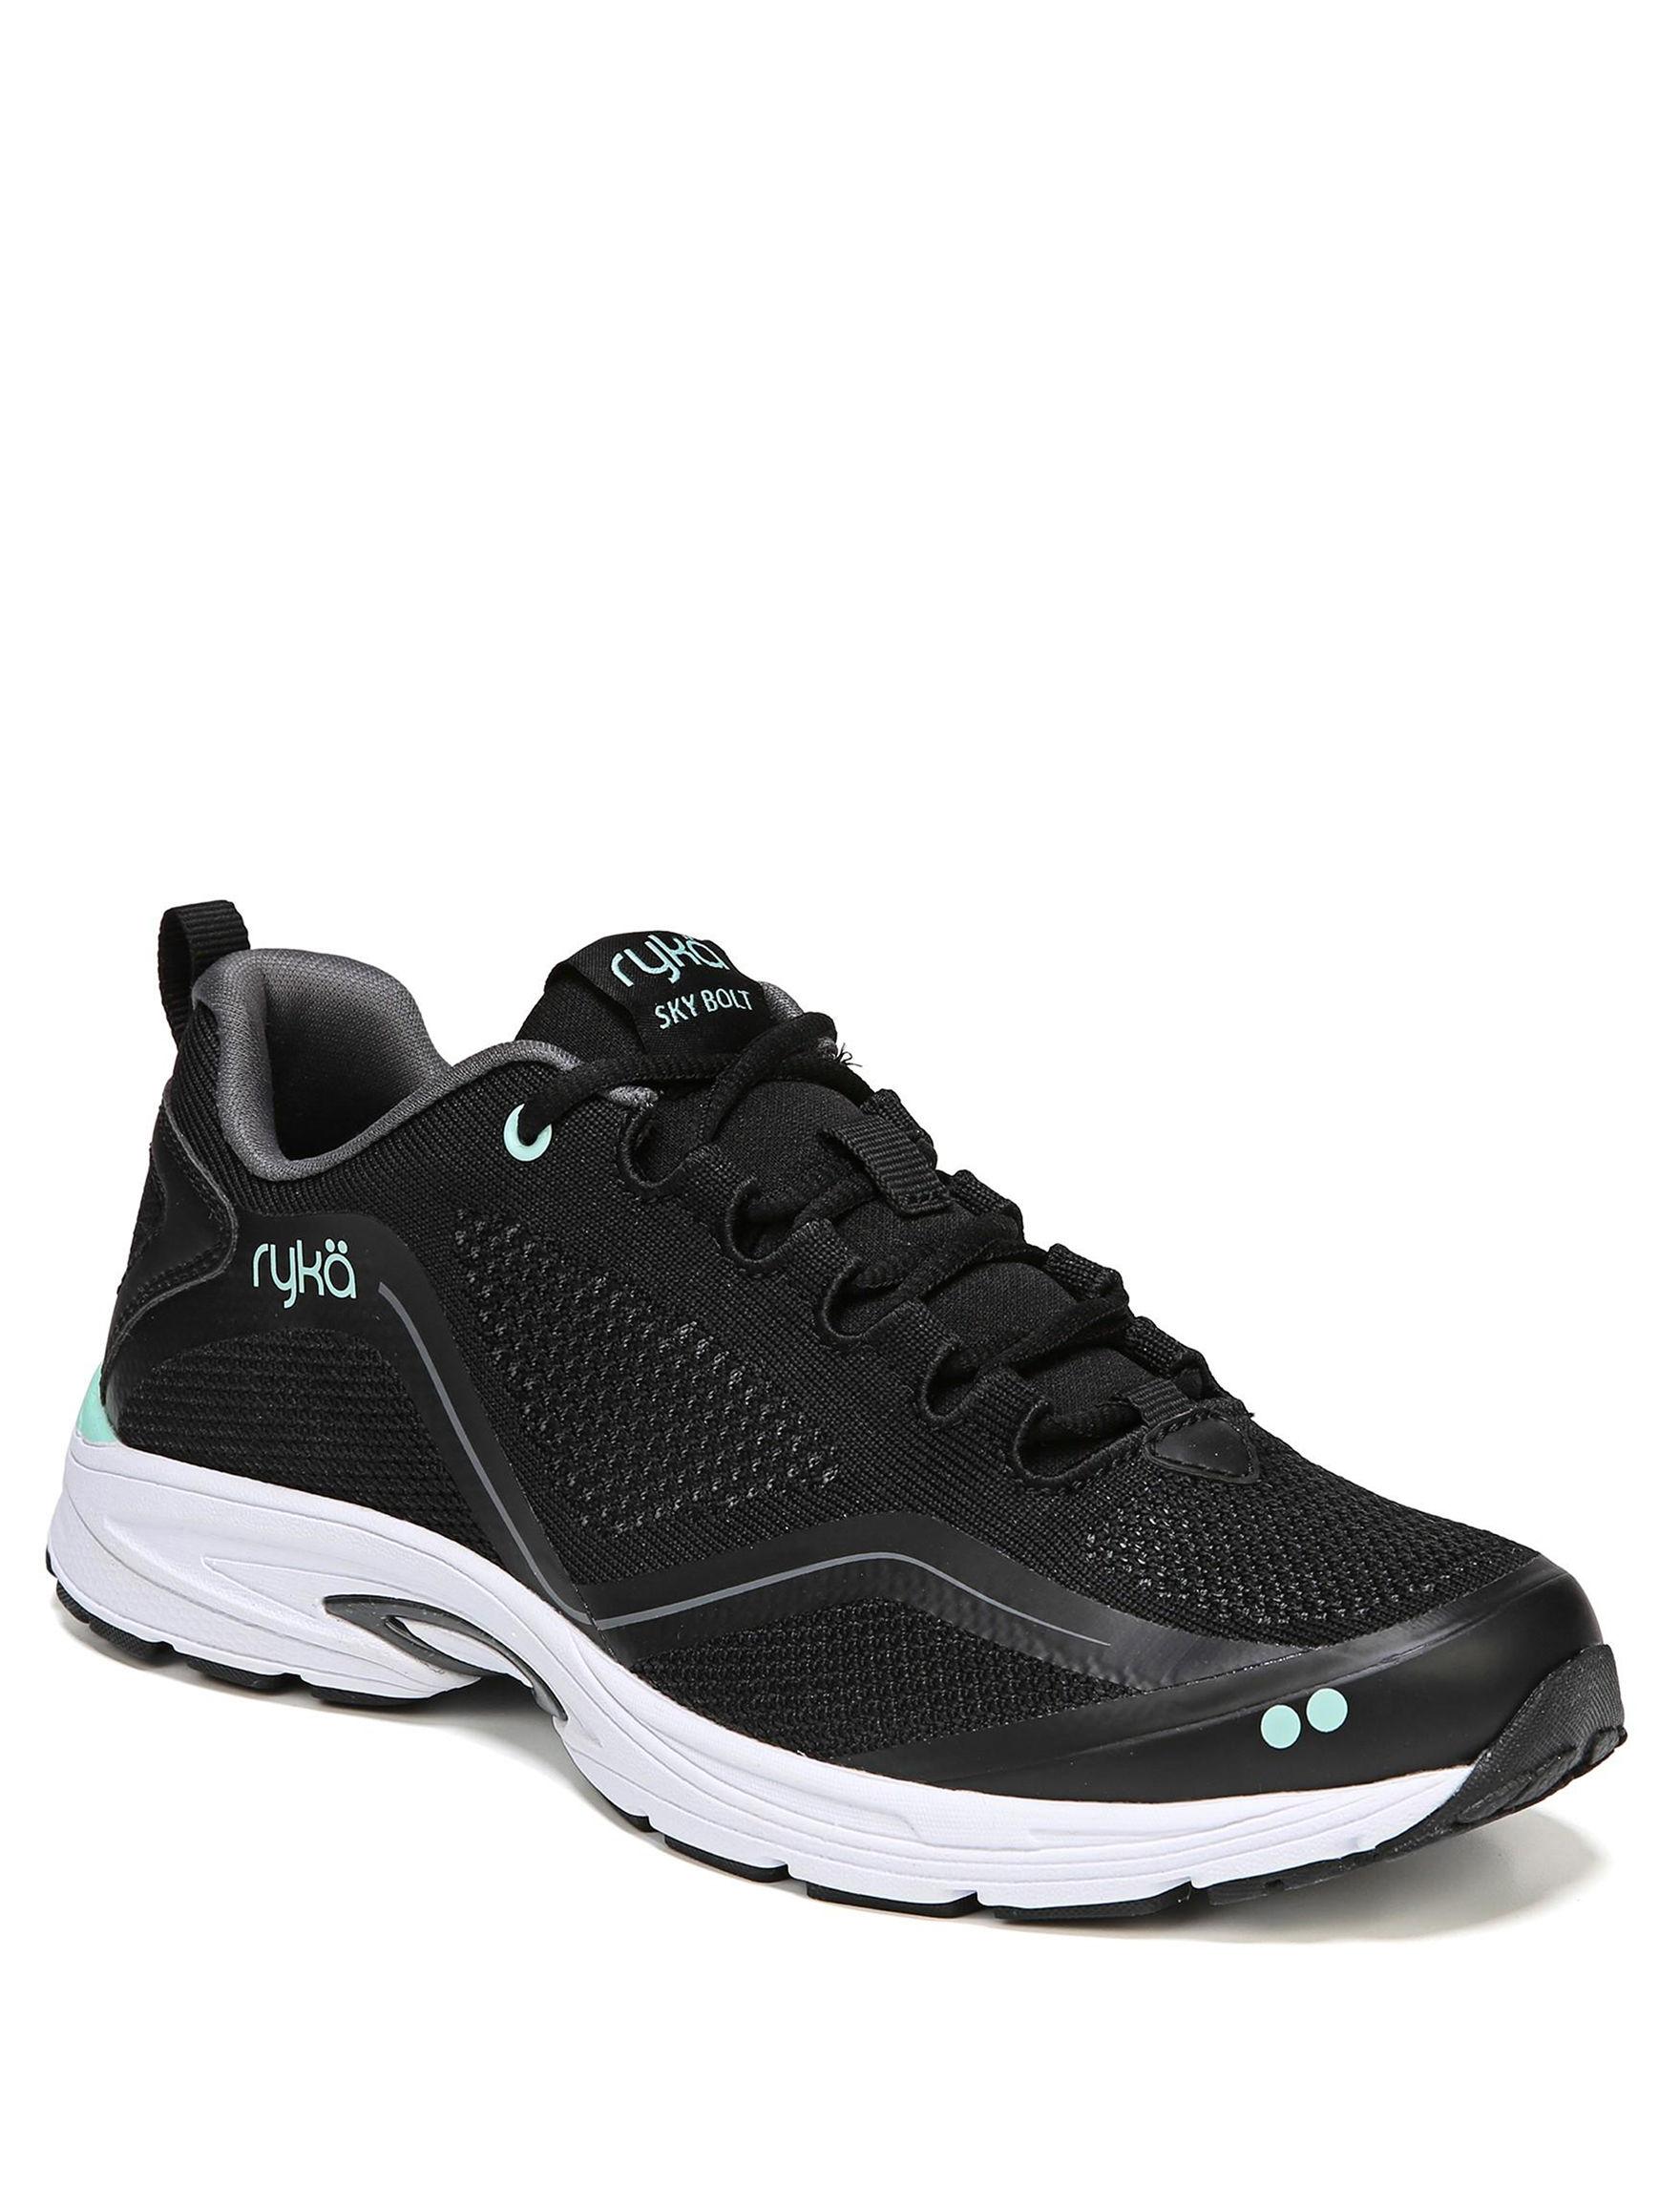 Ryka Black White Comfort Shoes